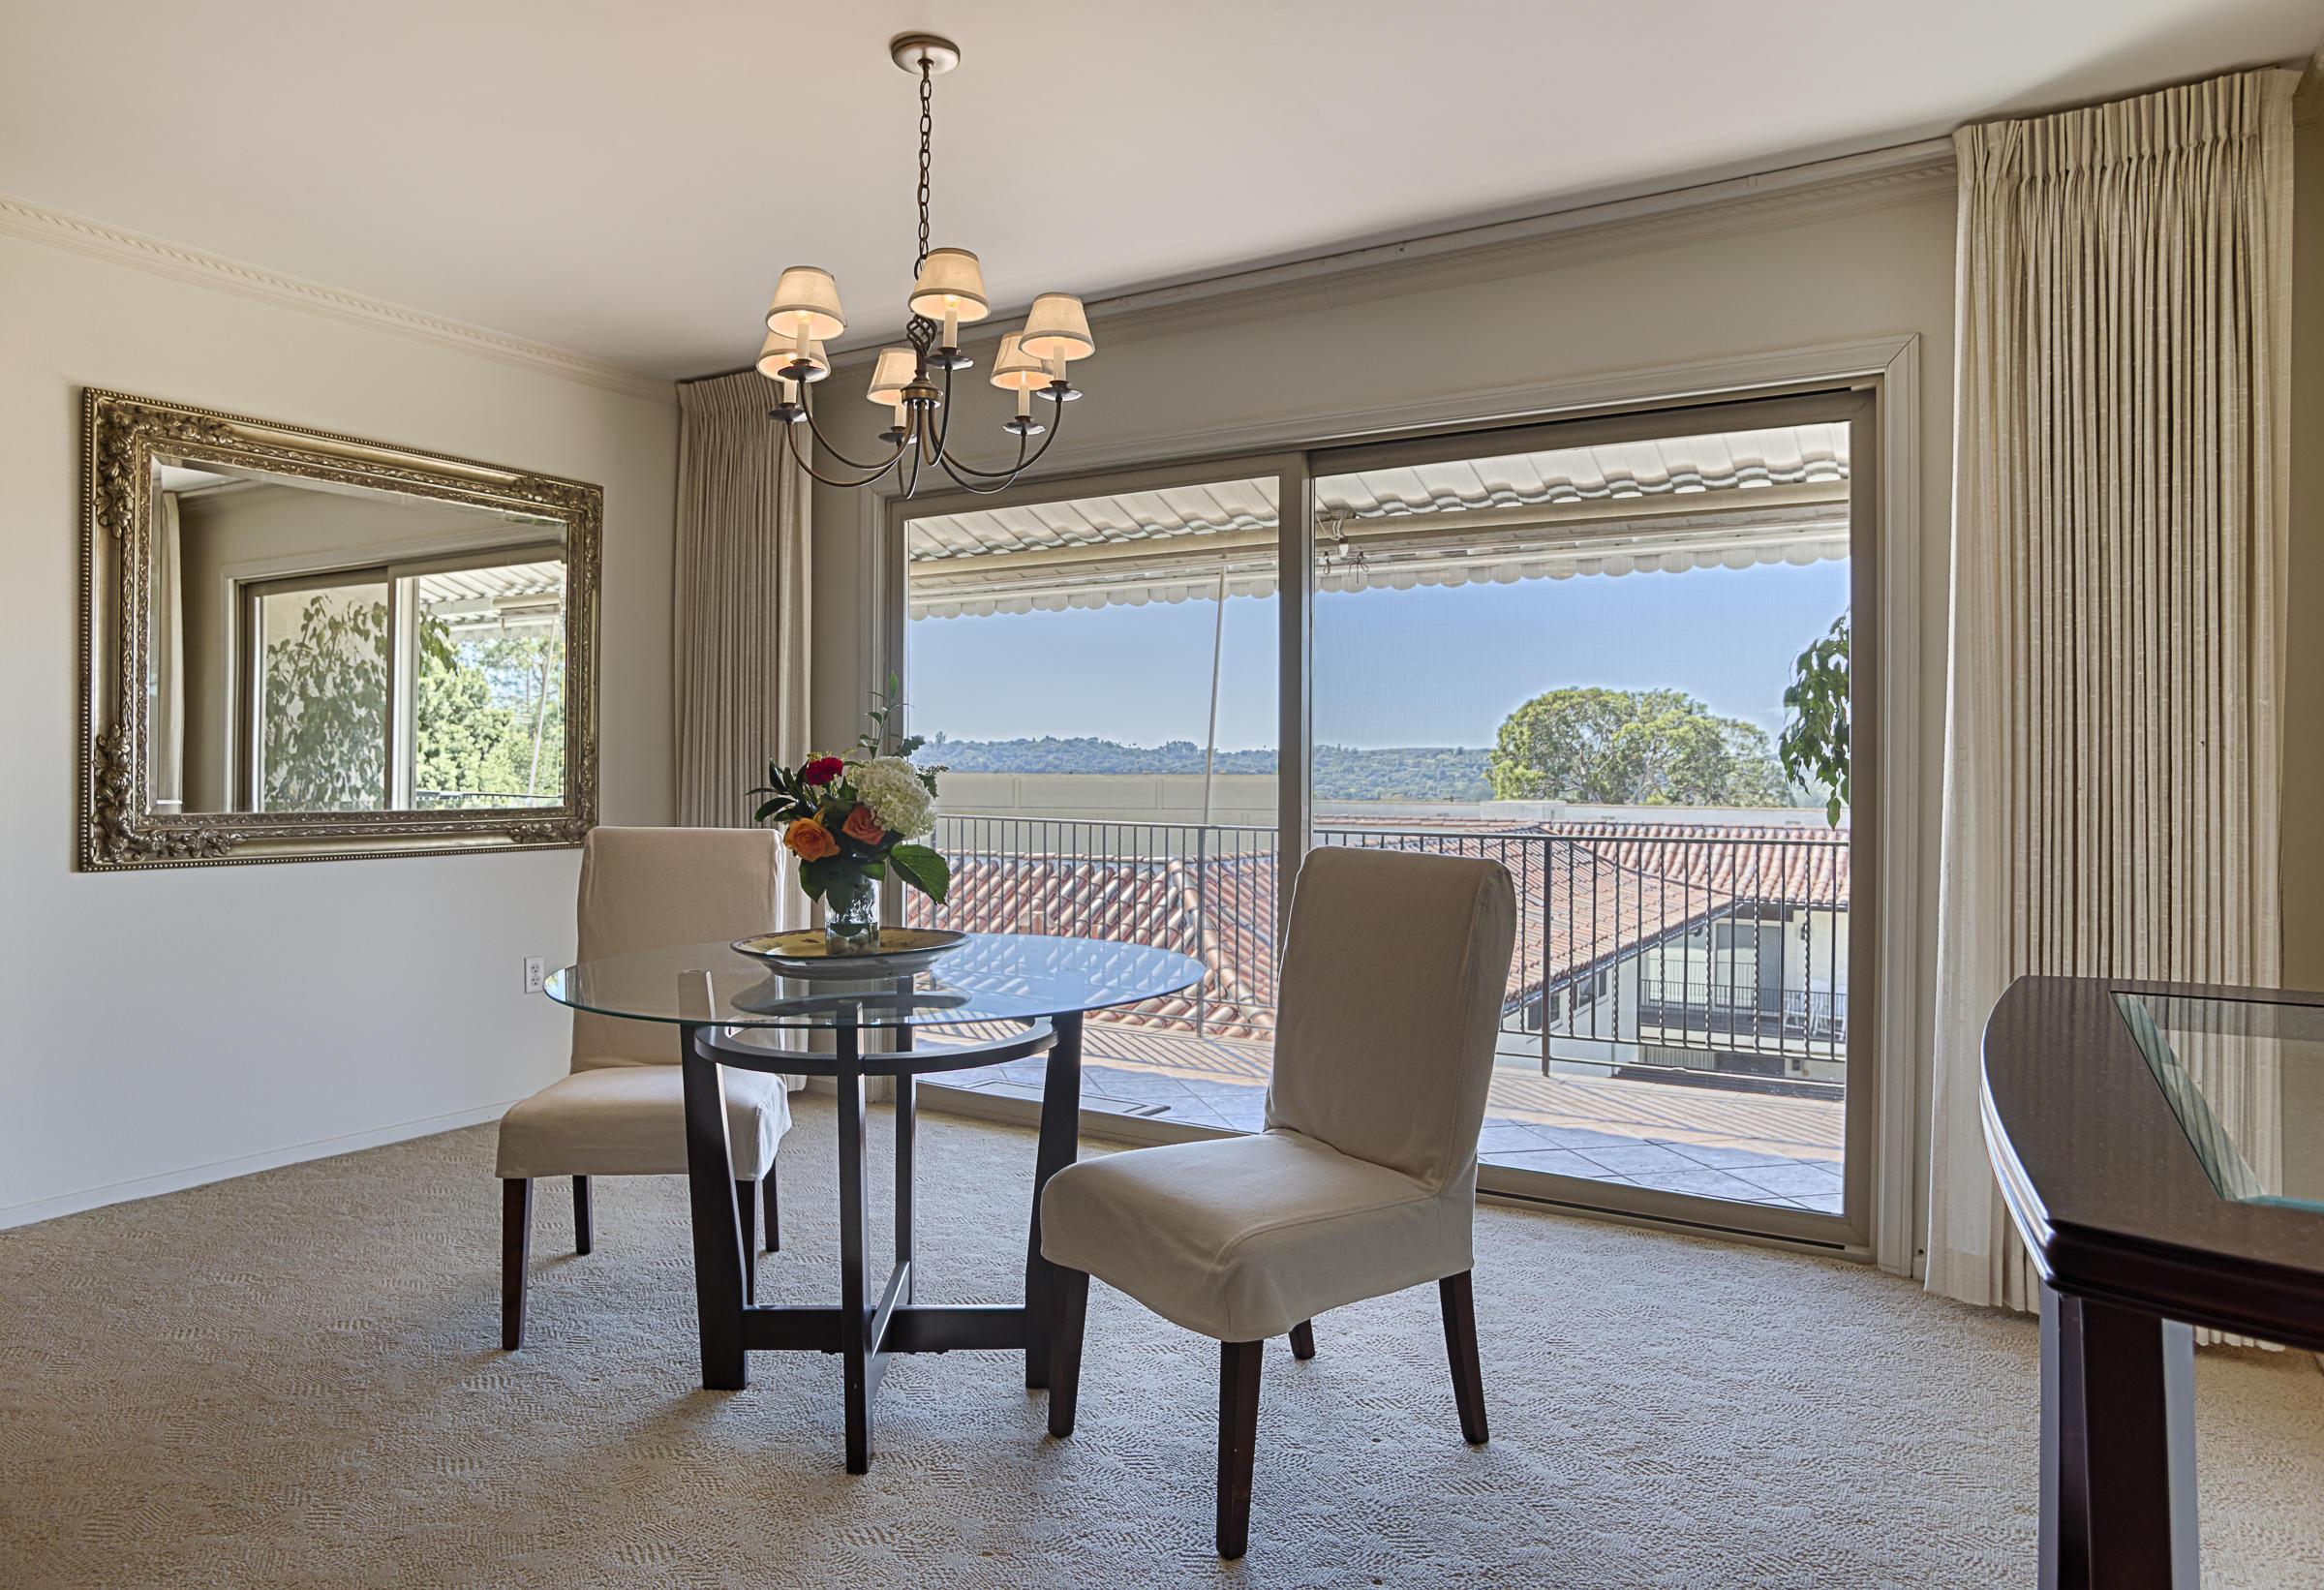 Property photo for 2525 State St #22 Santa Barbara, California 93105 - 17-3984